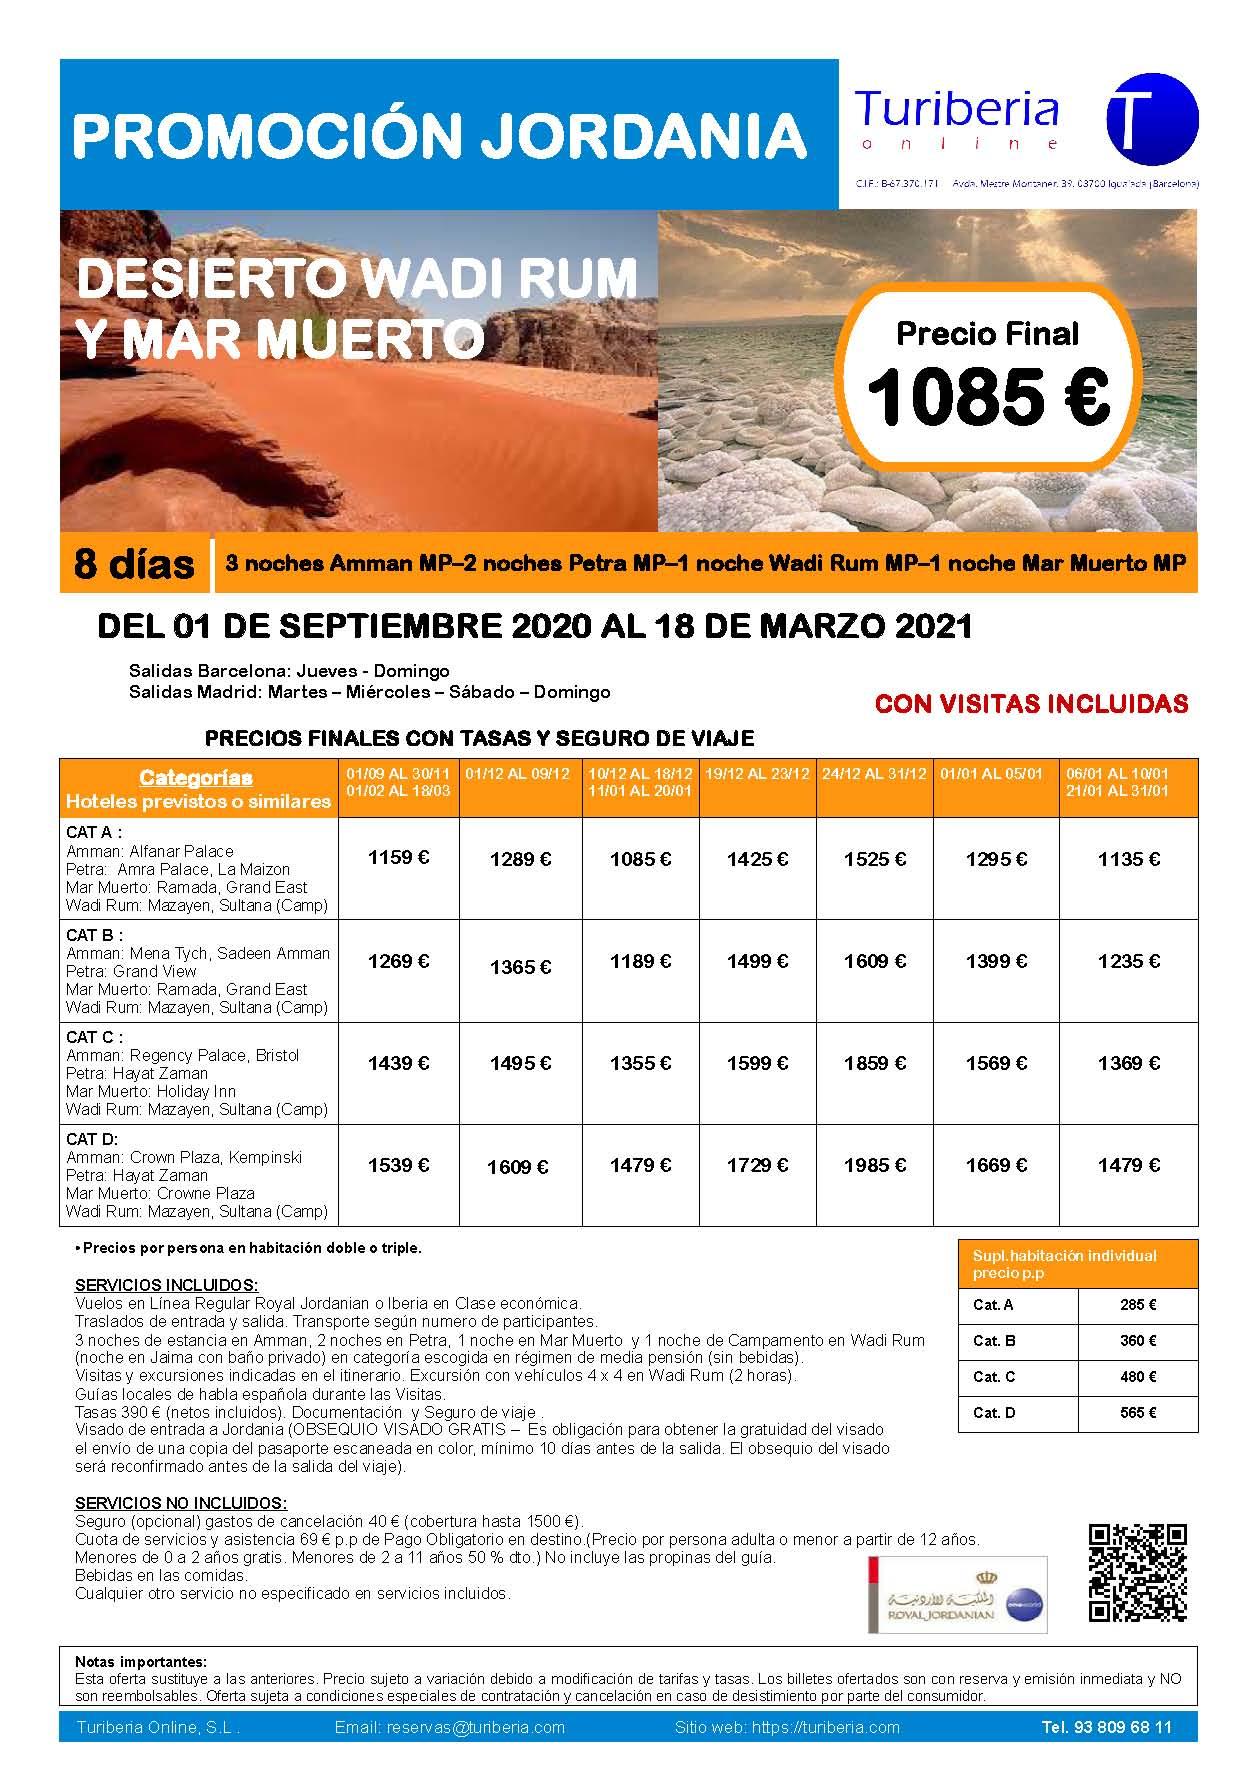 Oferta Turiberia Desierto de Wadi Rum y Mar Muerto 2021